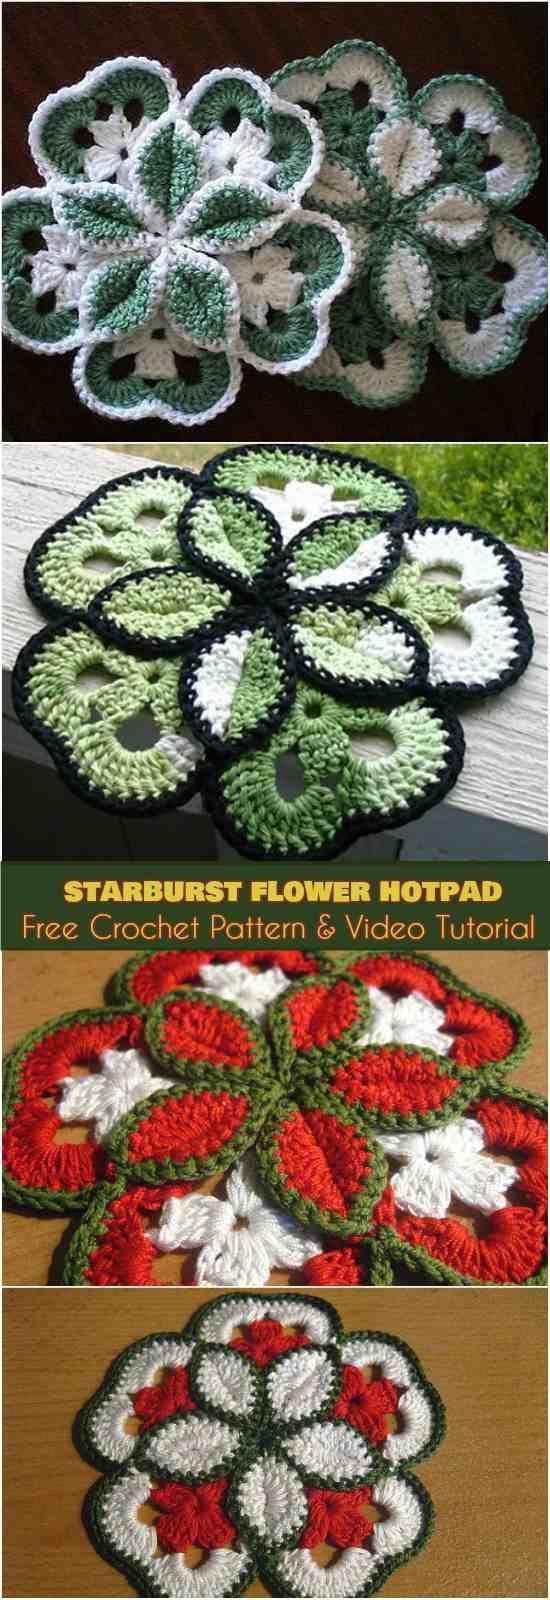 976 best Crochet Gifts images on Pinterest | Knit crochet, Crochet ...